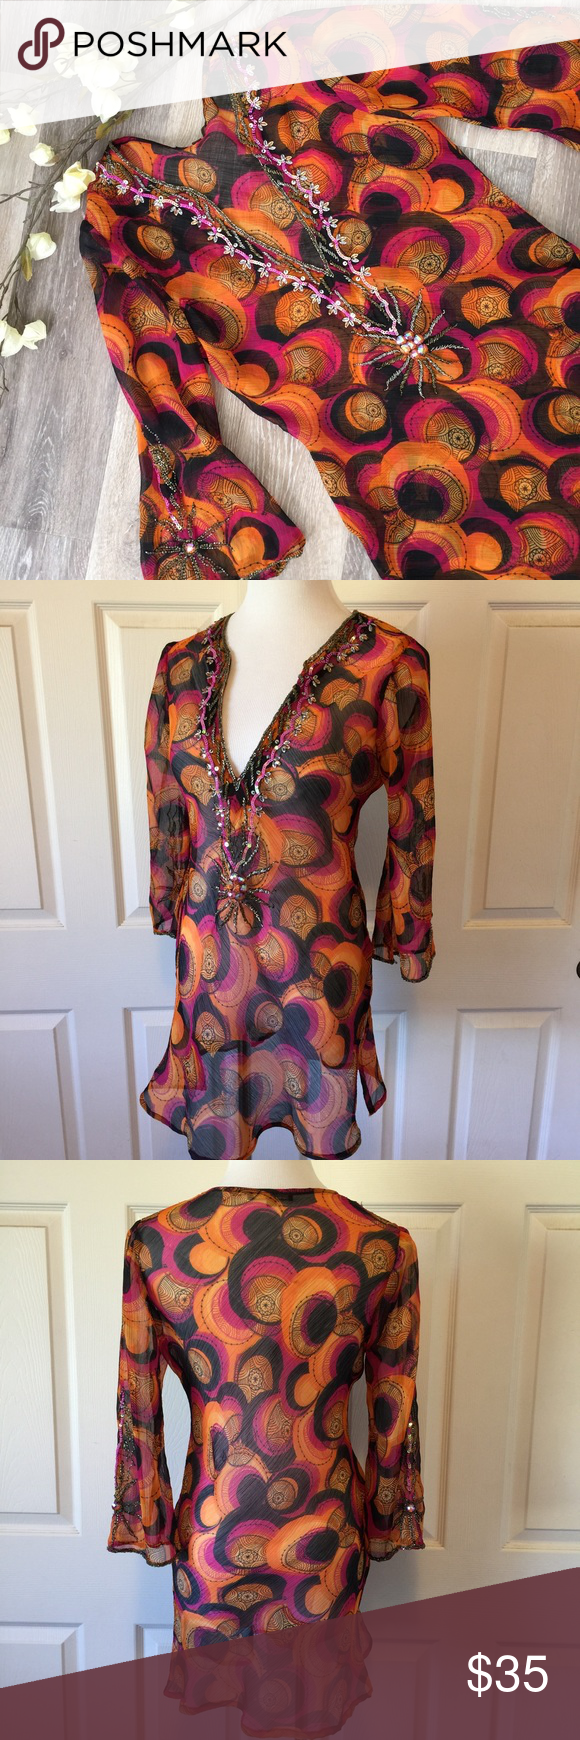 c551e8672b8 SEQUIN TUNIC Beautiful colors of orange, purple and black on this sheet Boho  tunic featuring